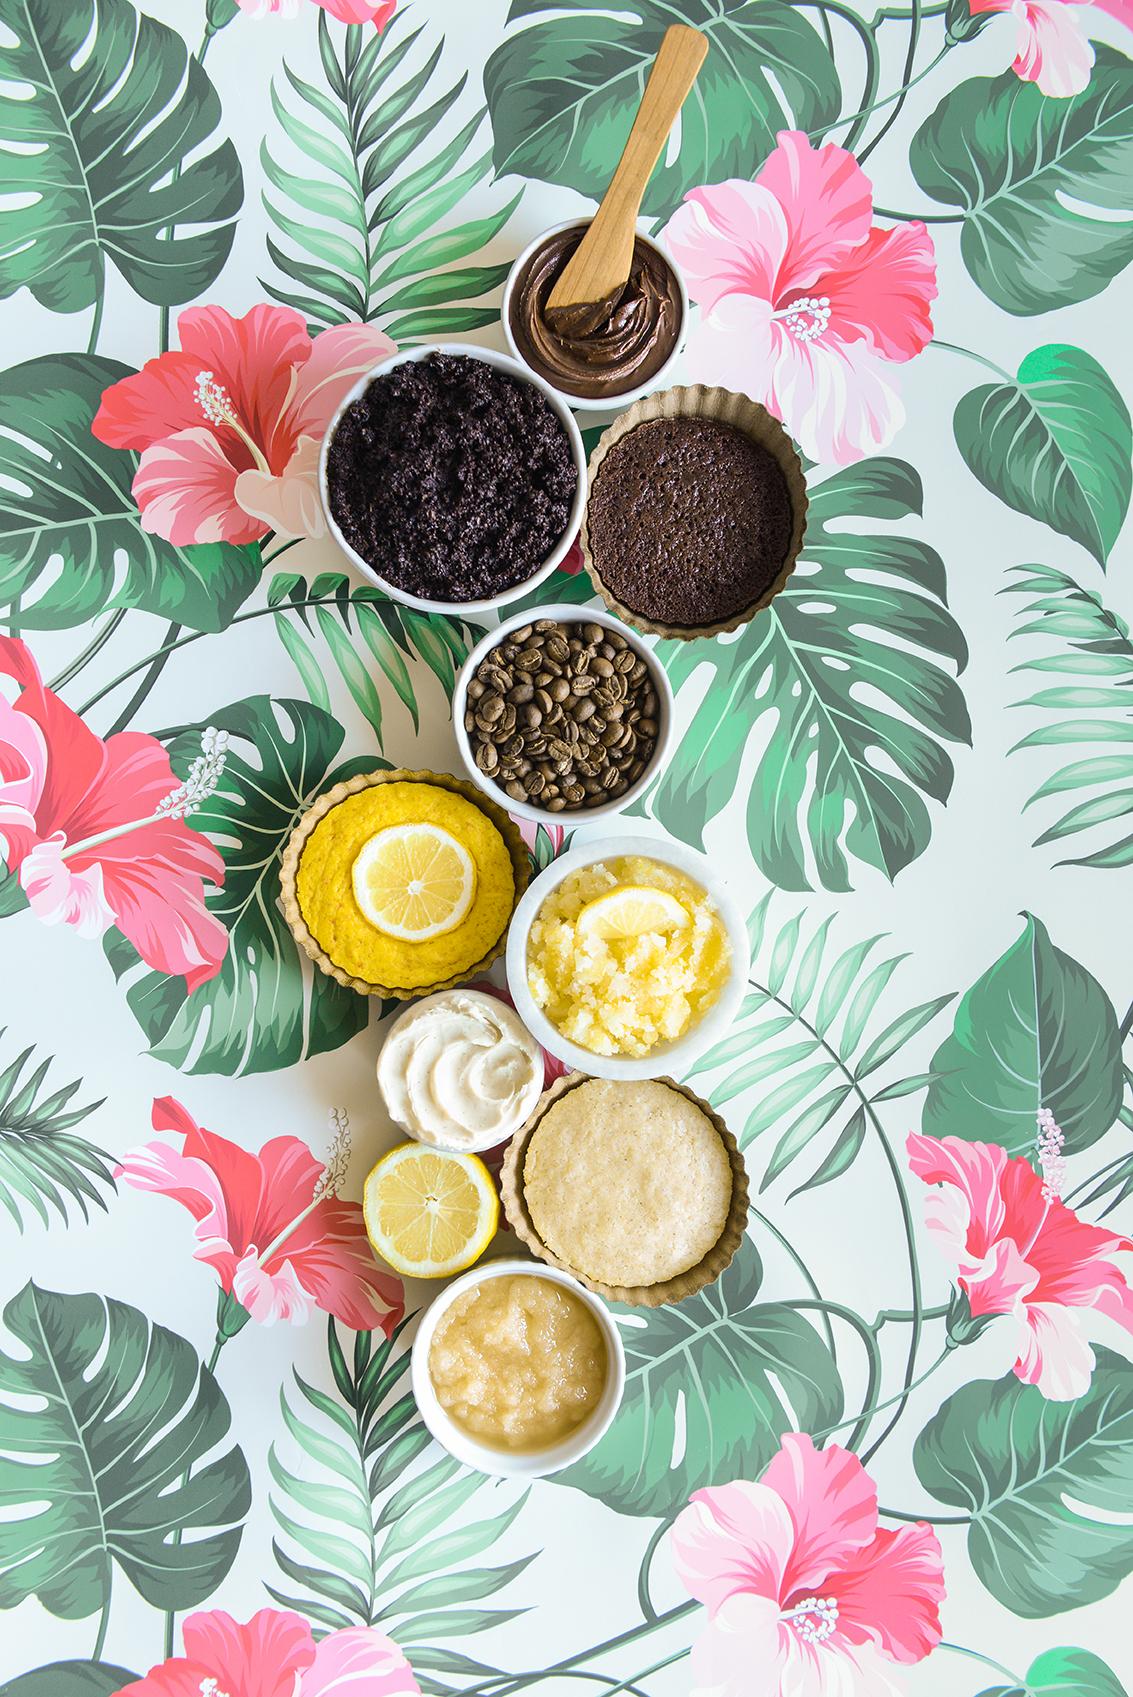 Homemade Sugar Scrub Flavors Inspired by Healthyish Cakes